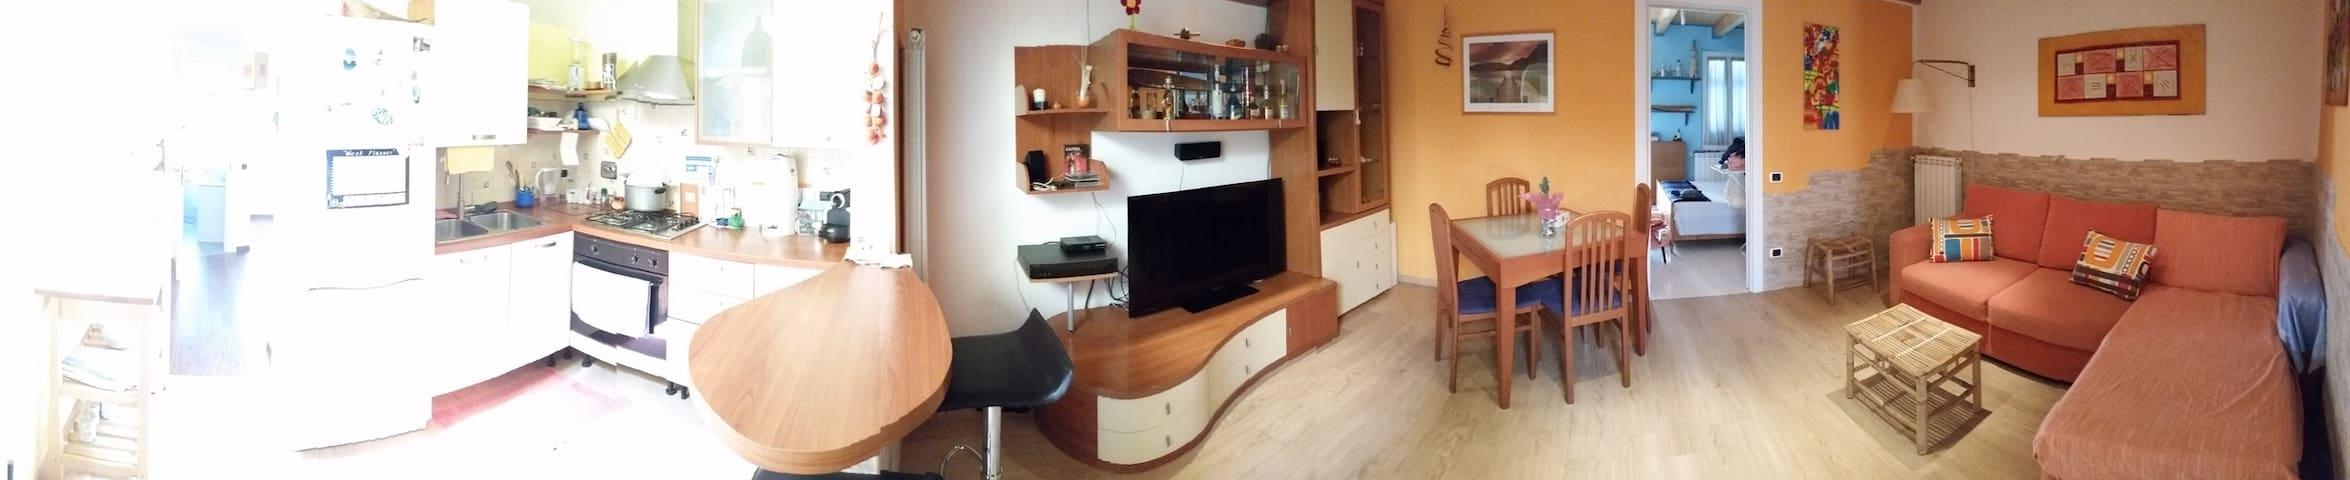 Confortevolissimo appartamento - Valleggia - Lakás